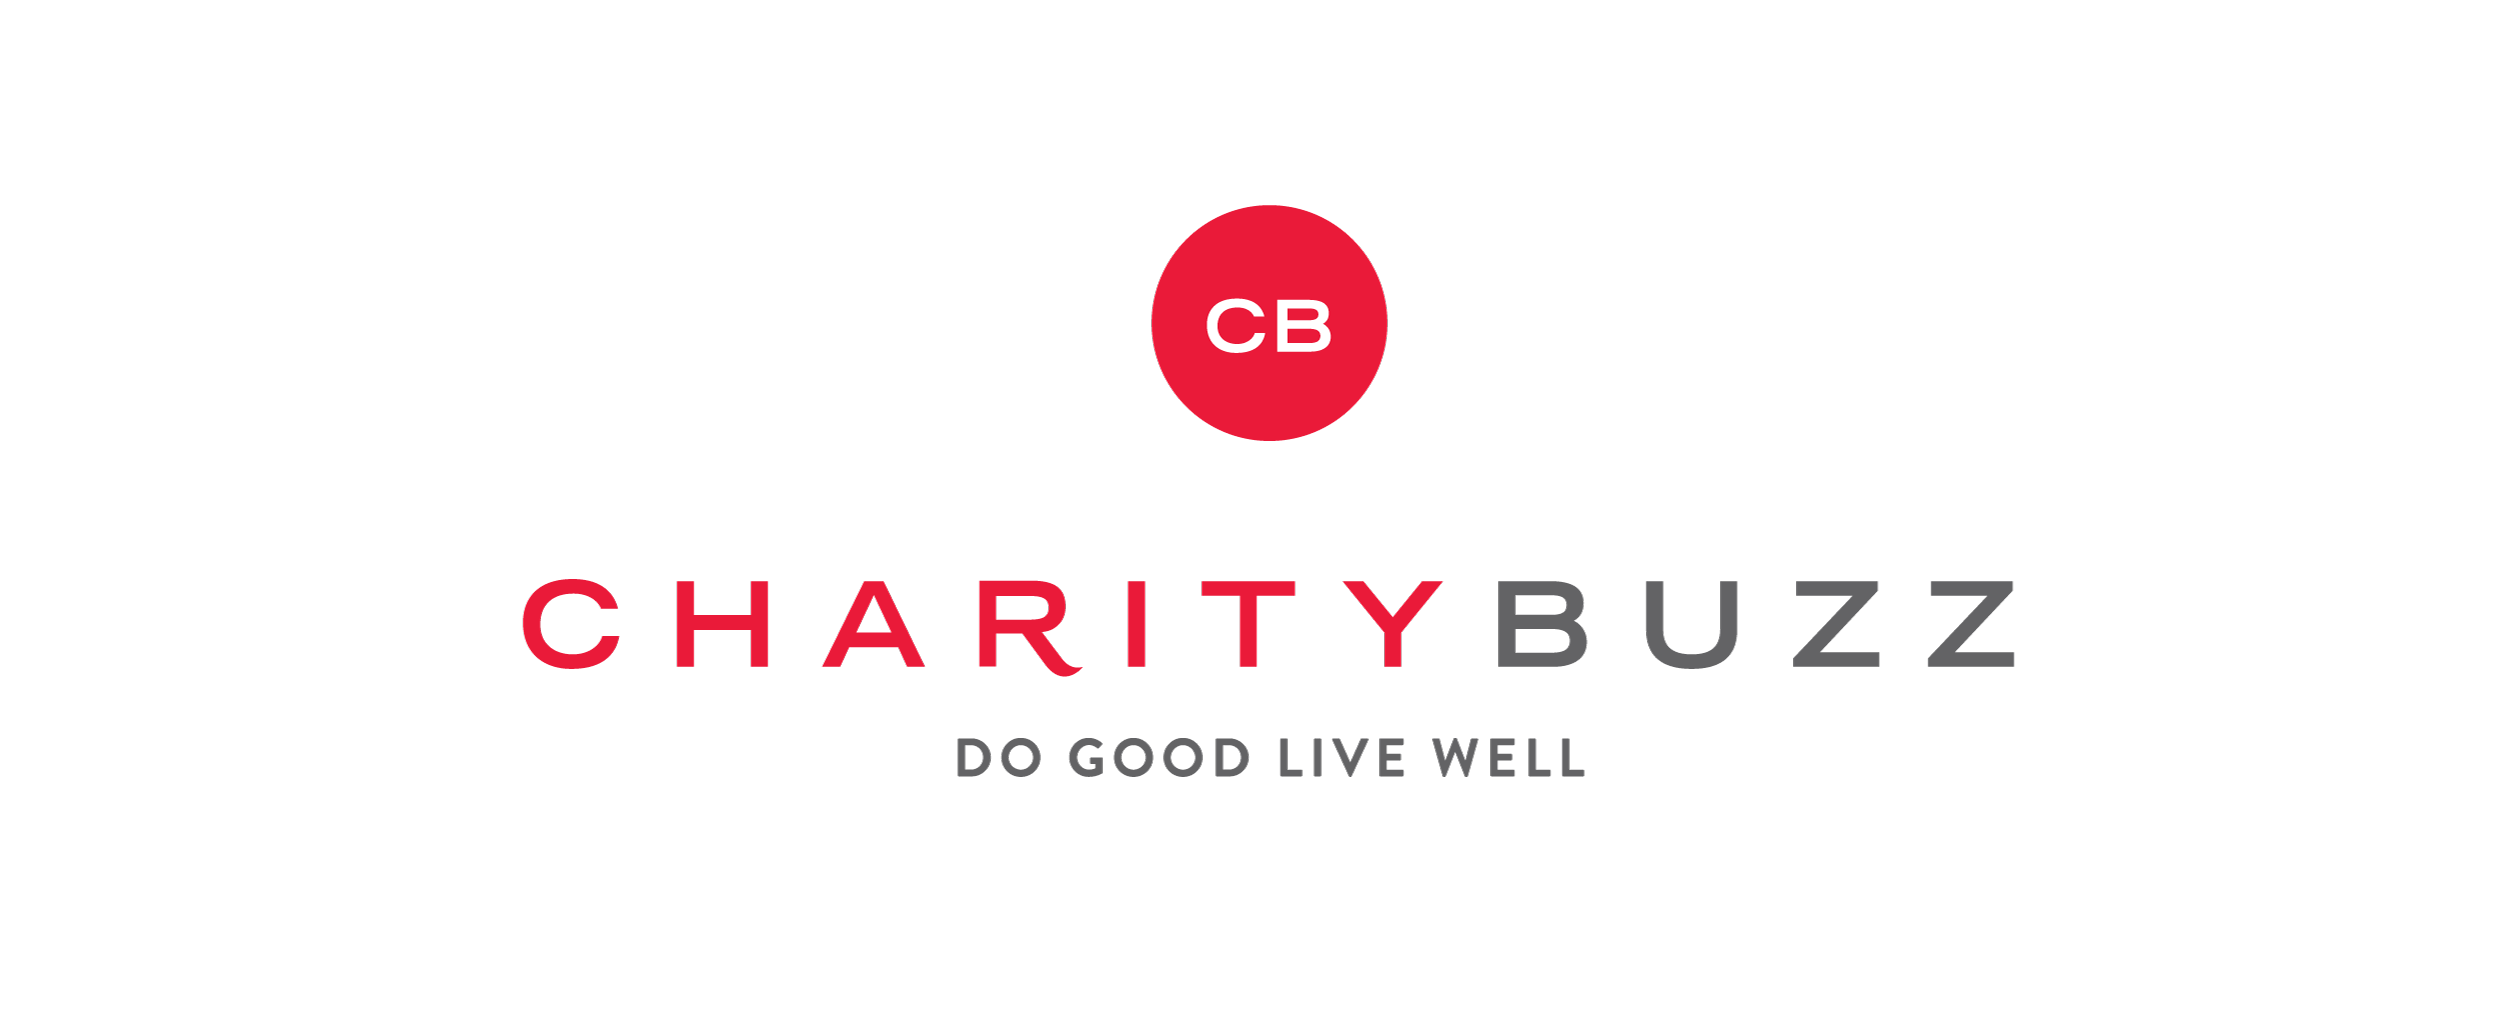 Charitybuzz